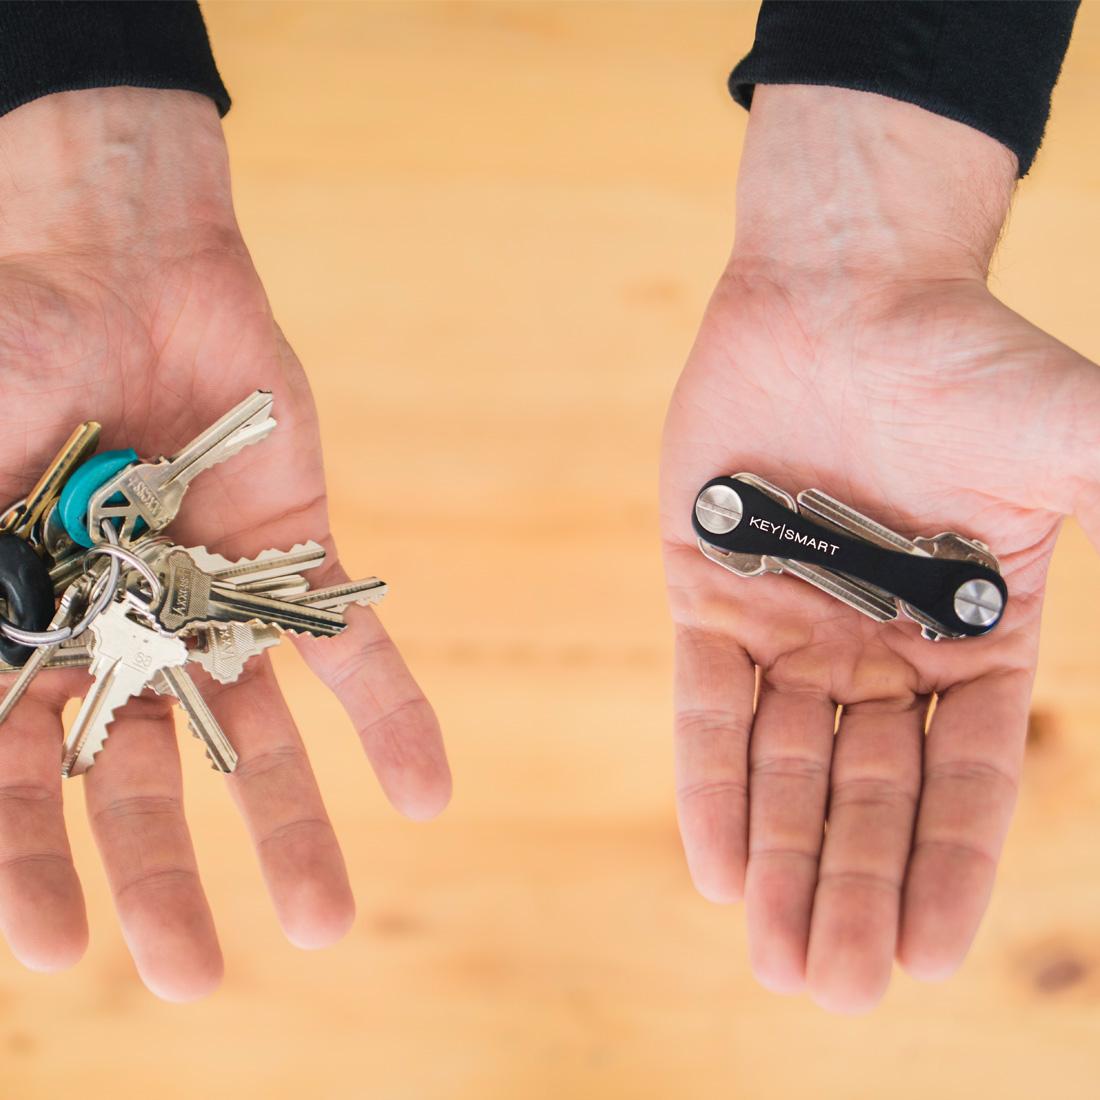 Keysmart Key Organizer Was Made For The Minimalist In You